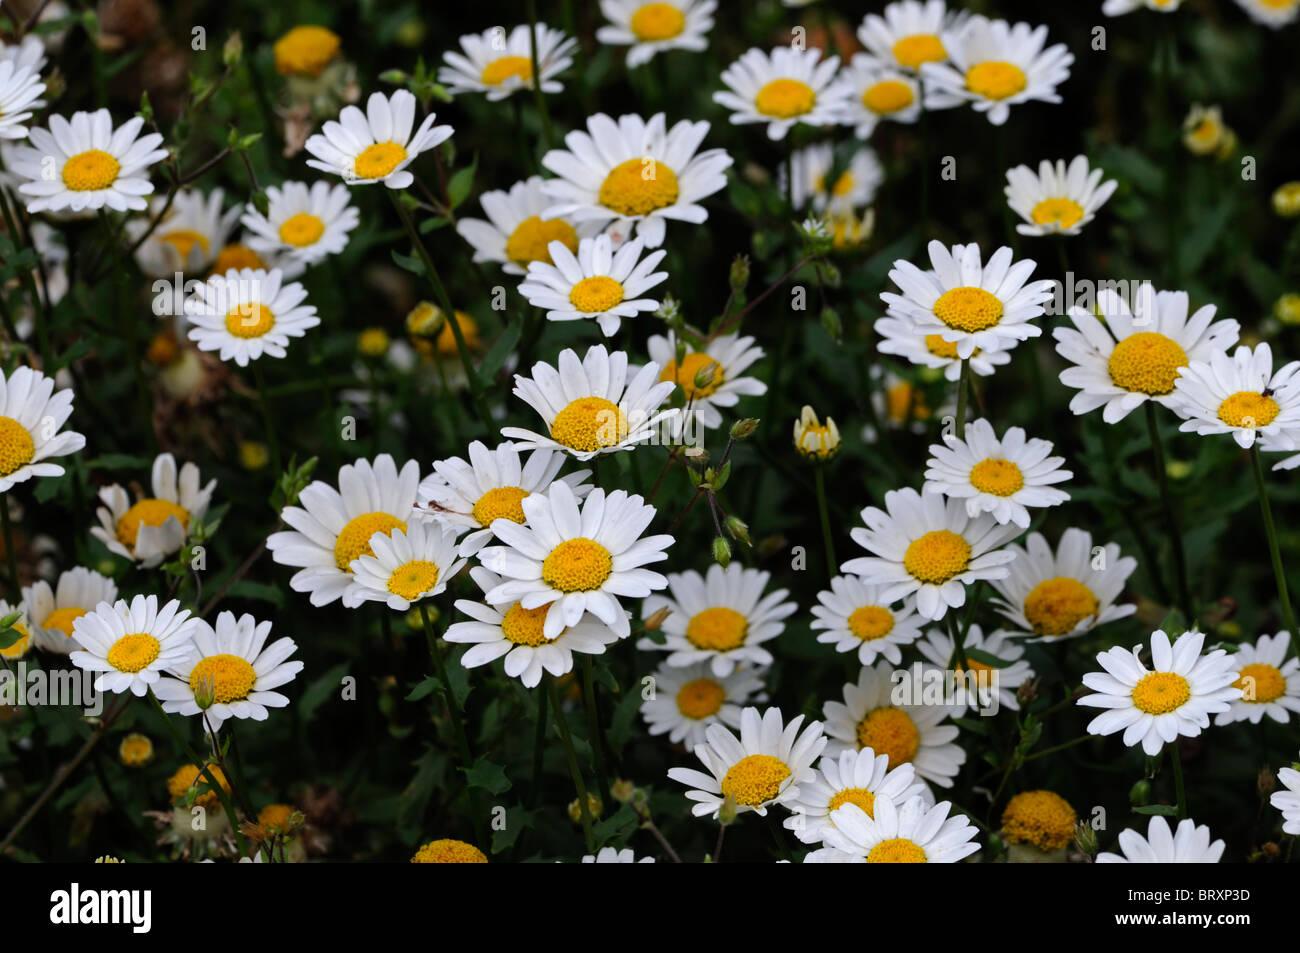 Chrysanthemum paludosum snowland daisy dwarf daisy type hardy chrysanthemum paludosum snowland daisy dwarf daisy type hardy annual tender perennial mum chrysanth white flower stock dhlflorist Images